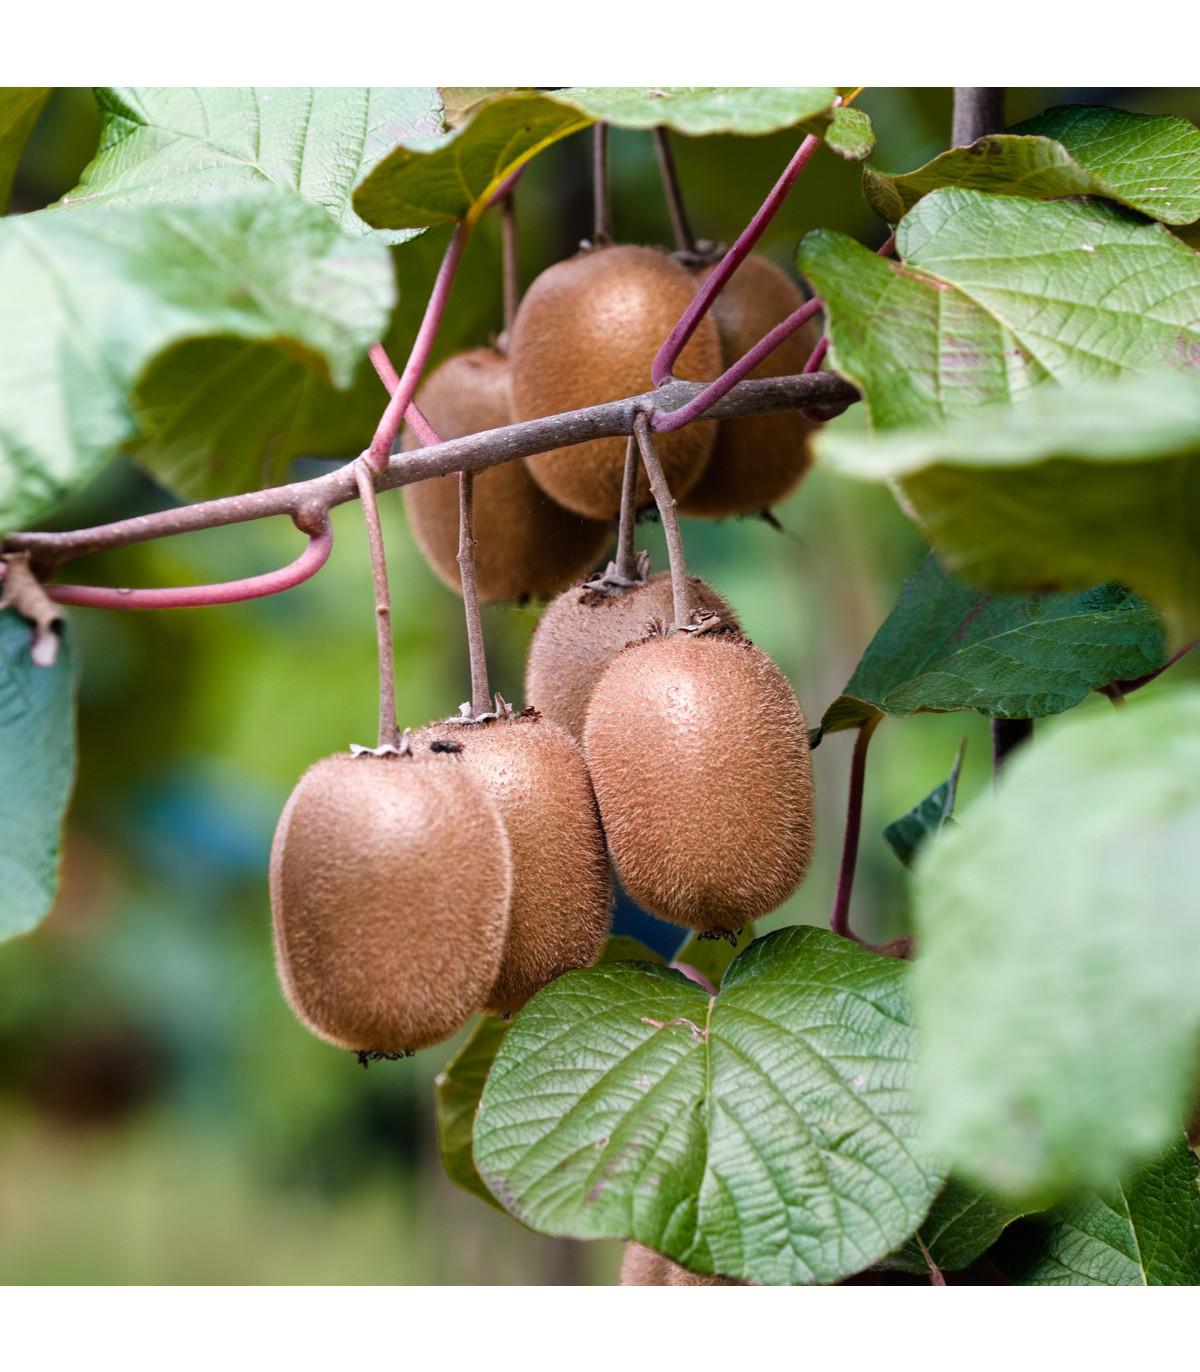 Kiwi čínské - Aktinidie - Actinidia chinensis - osivo kiwi - 5 ks